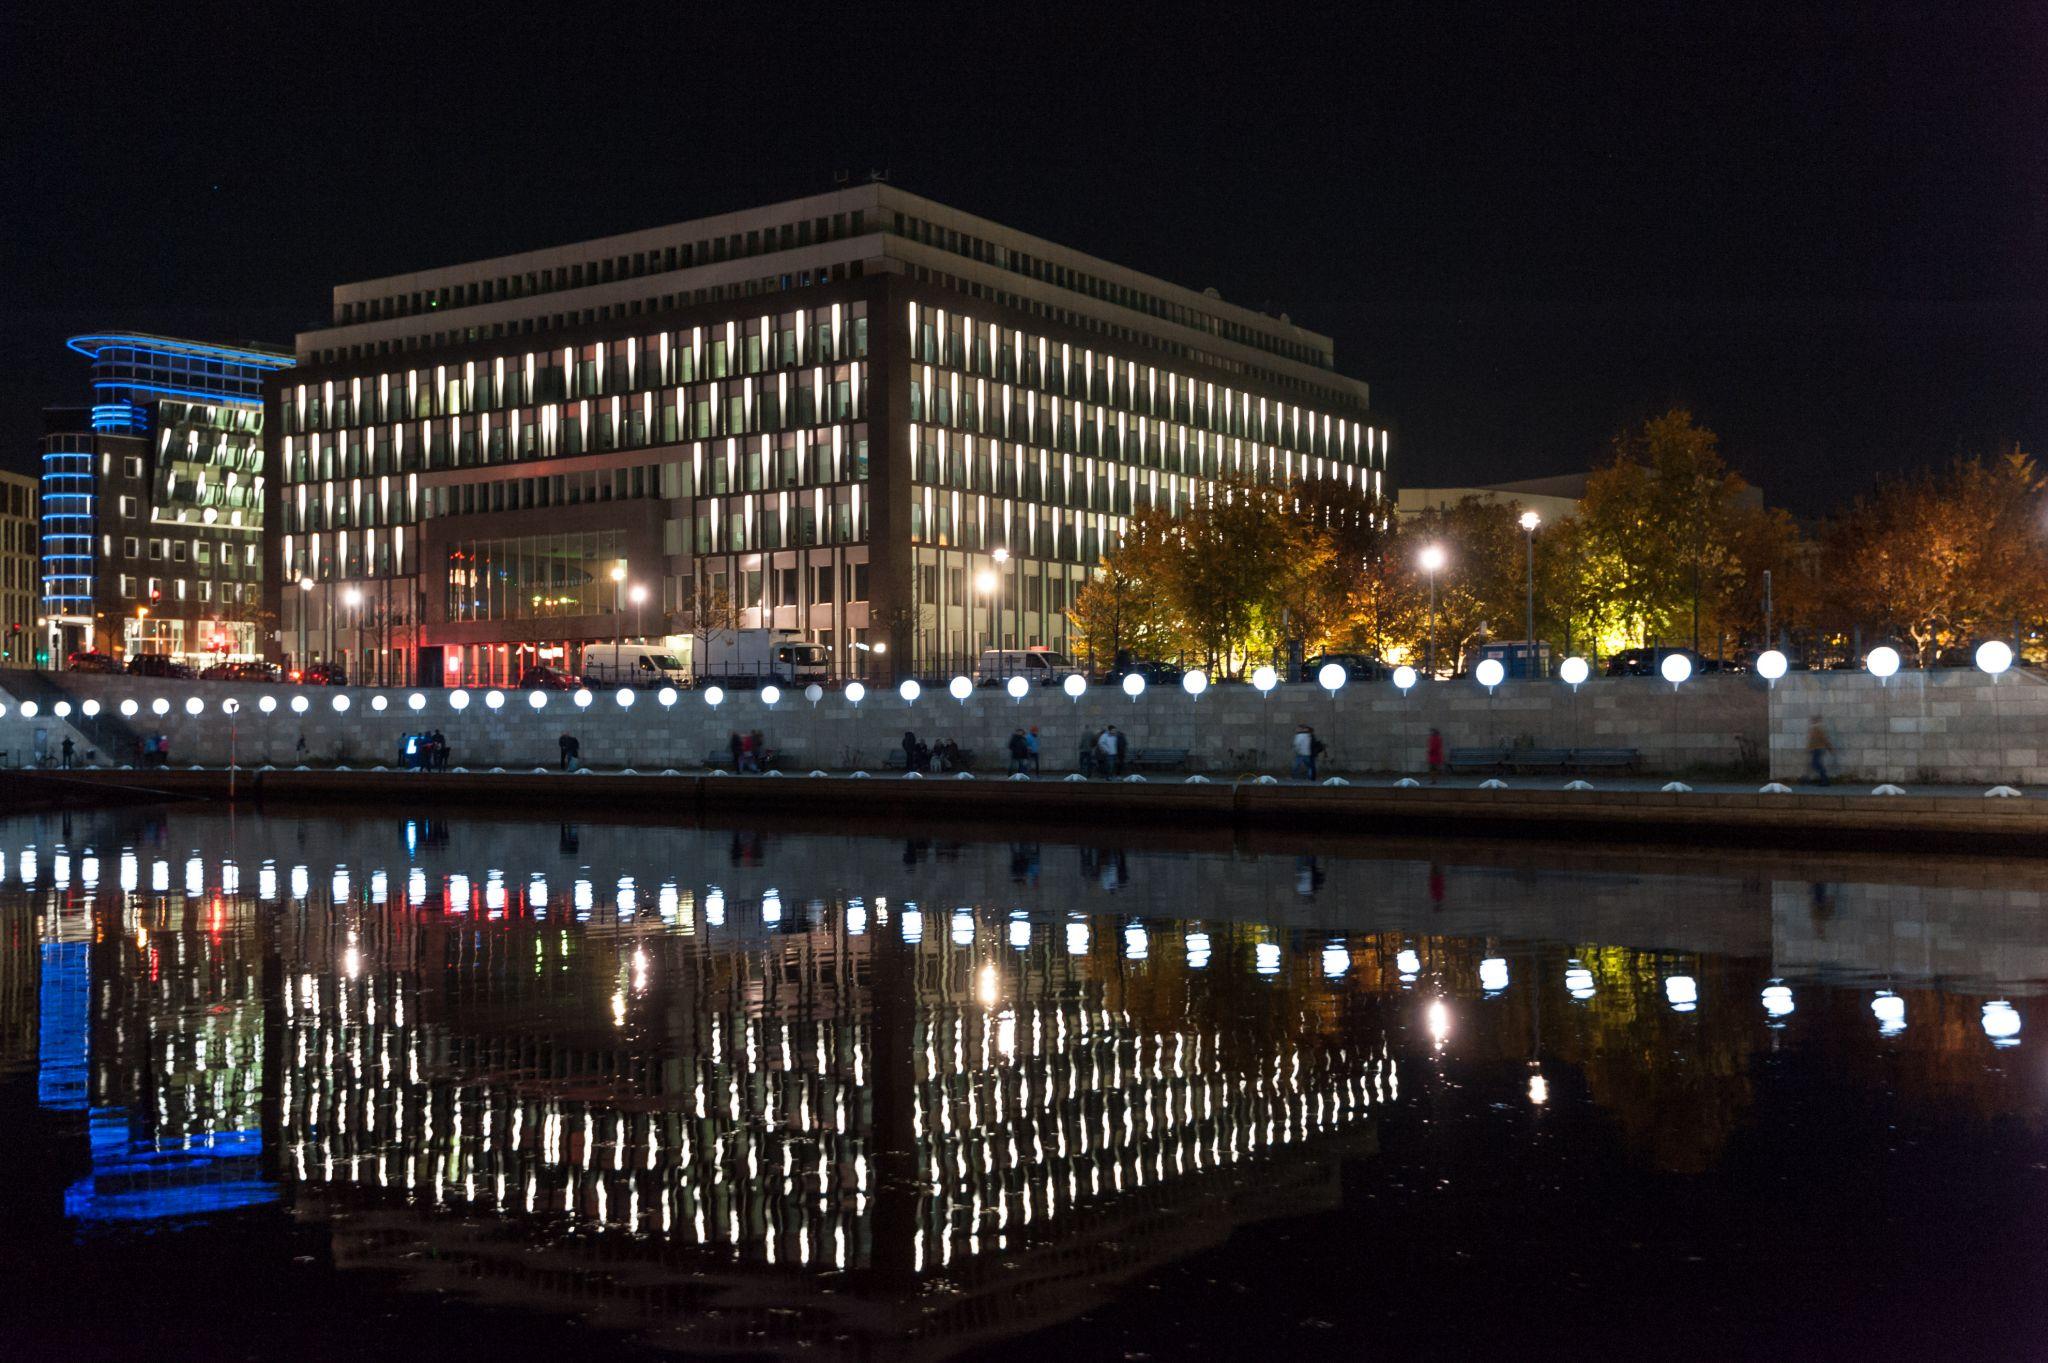 Bundespressehaus, Germany